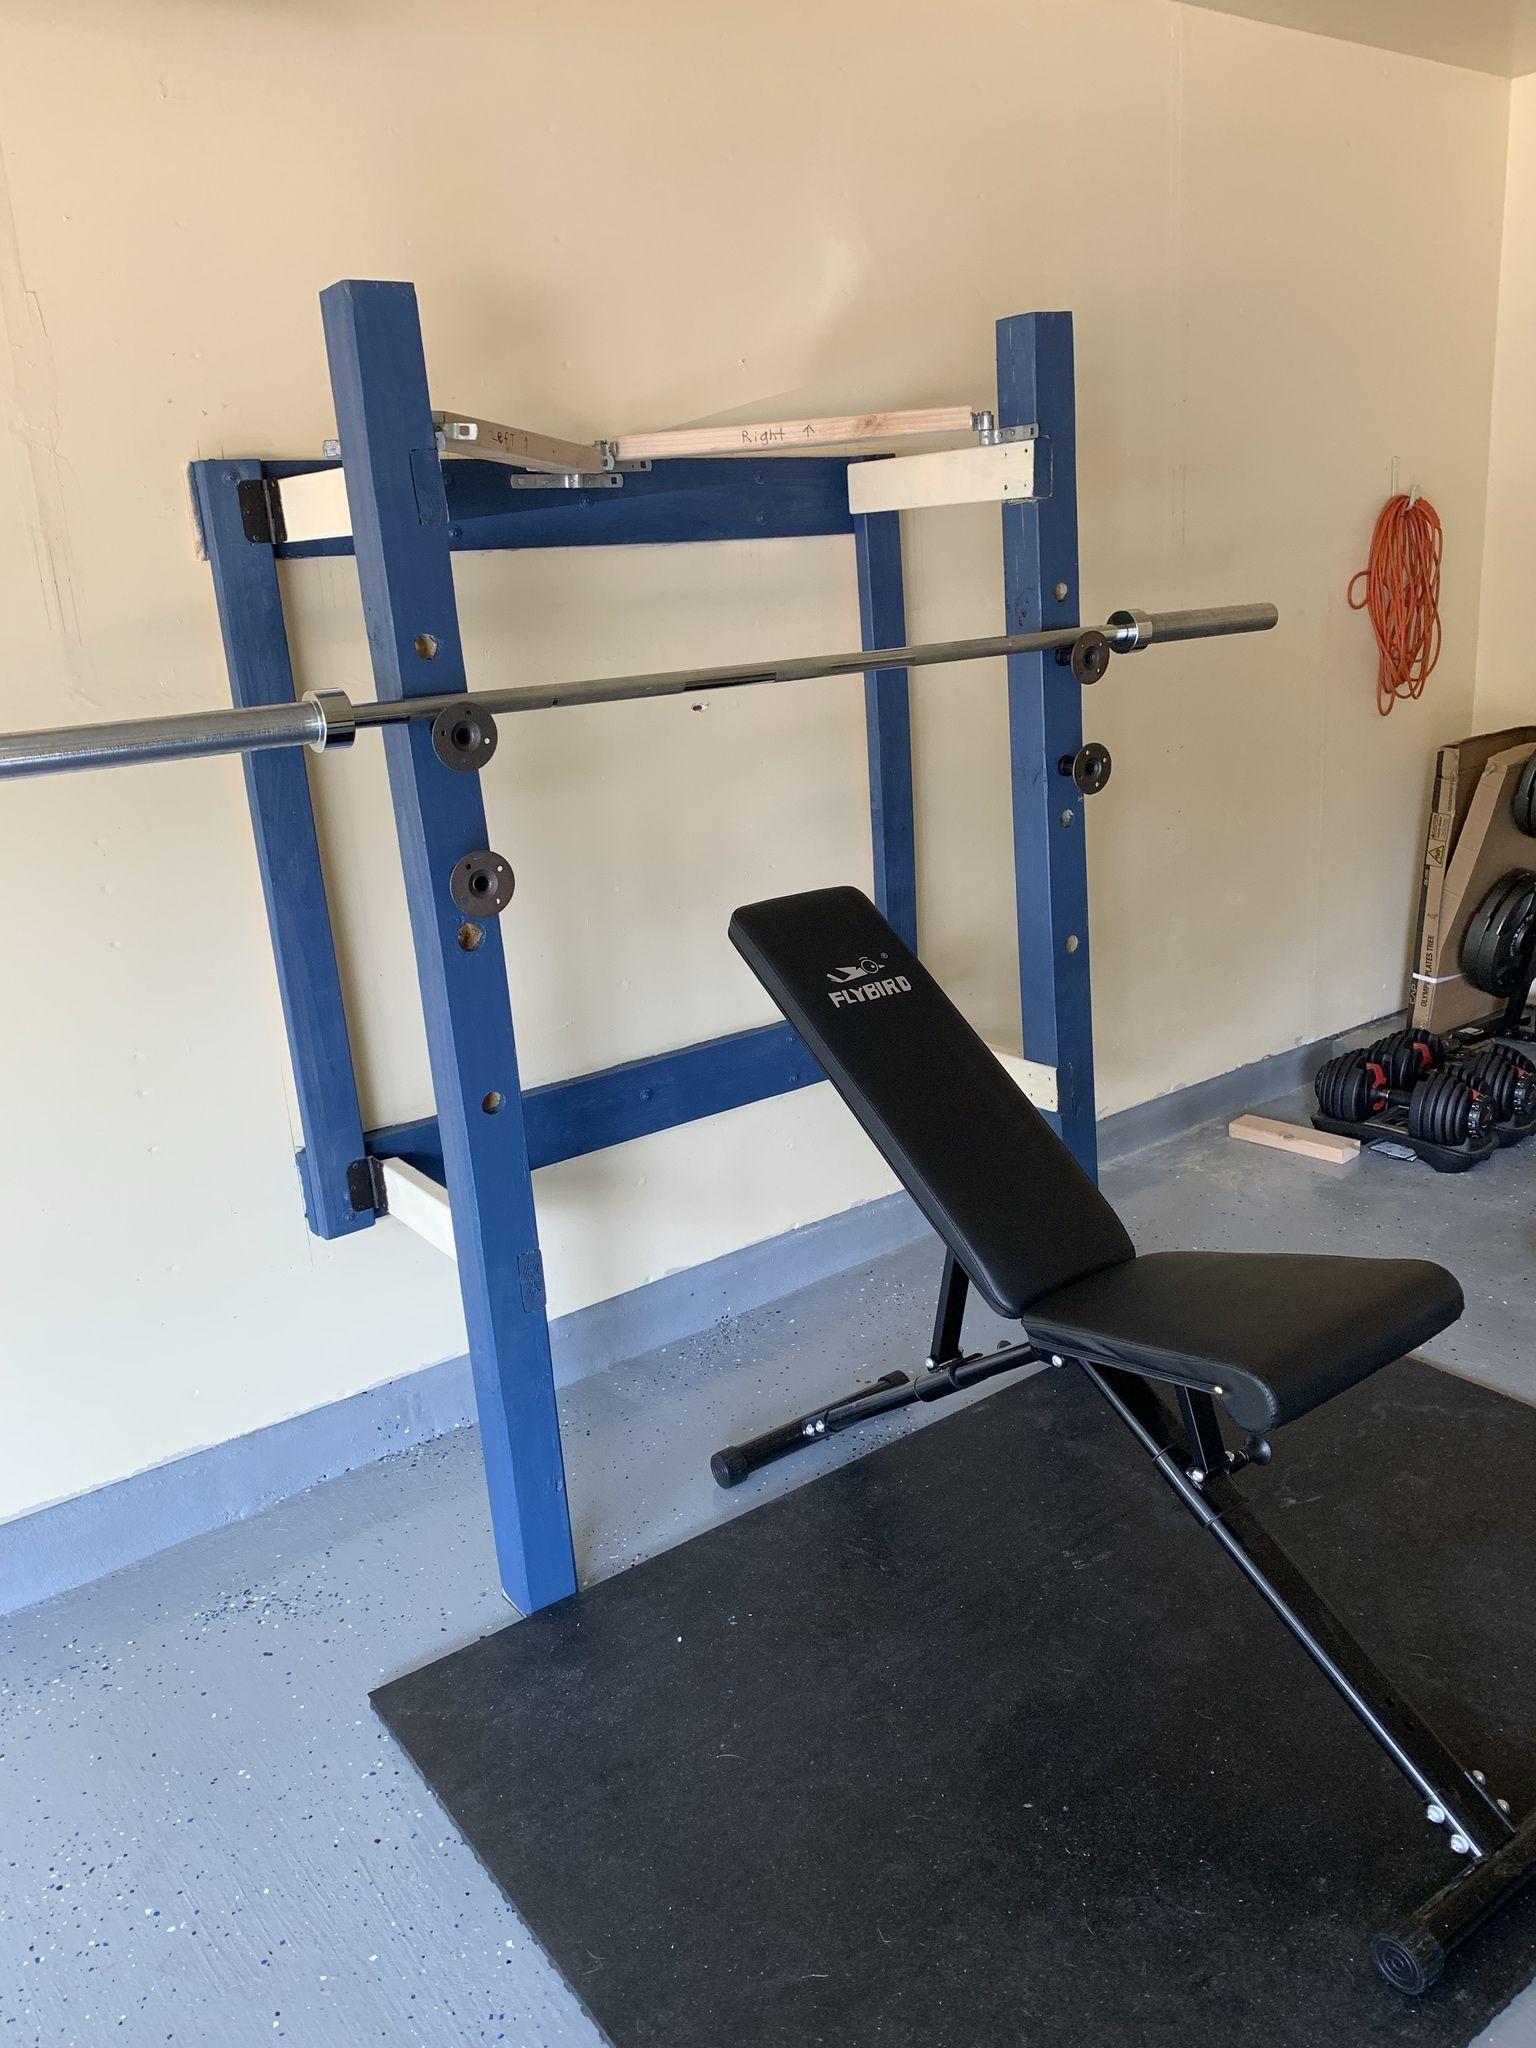 Diy folding squat rack imgur in 2020 squat rack diy